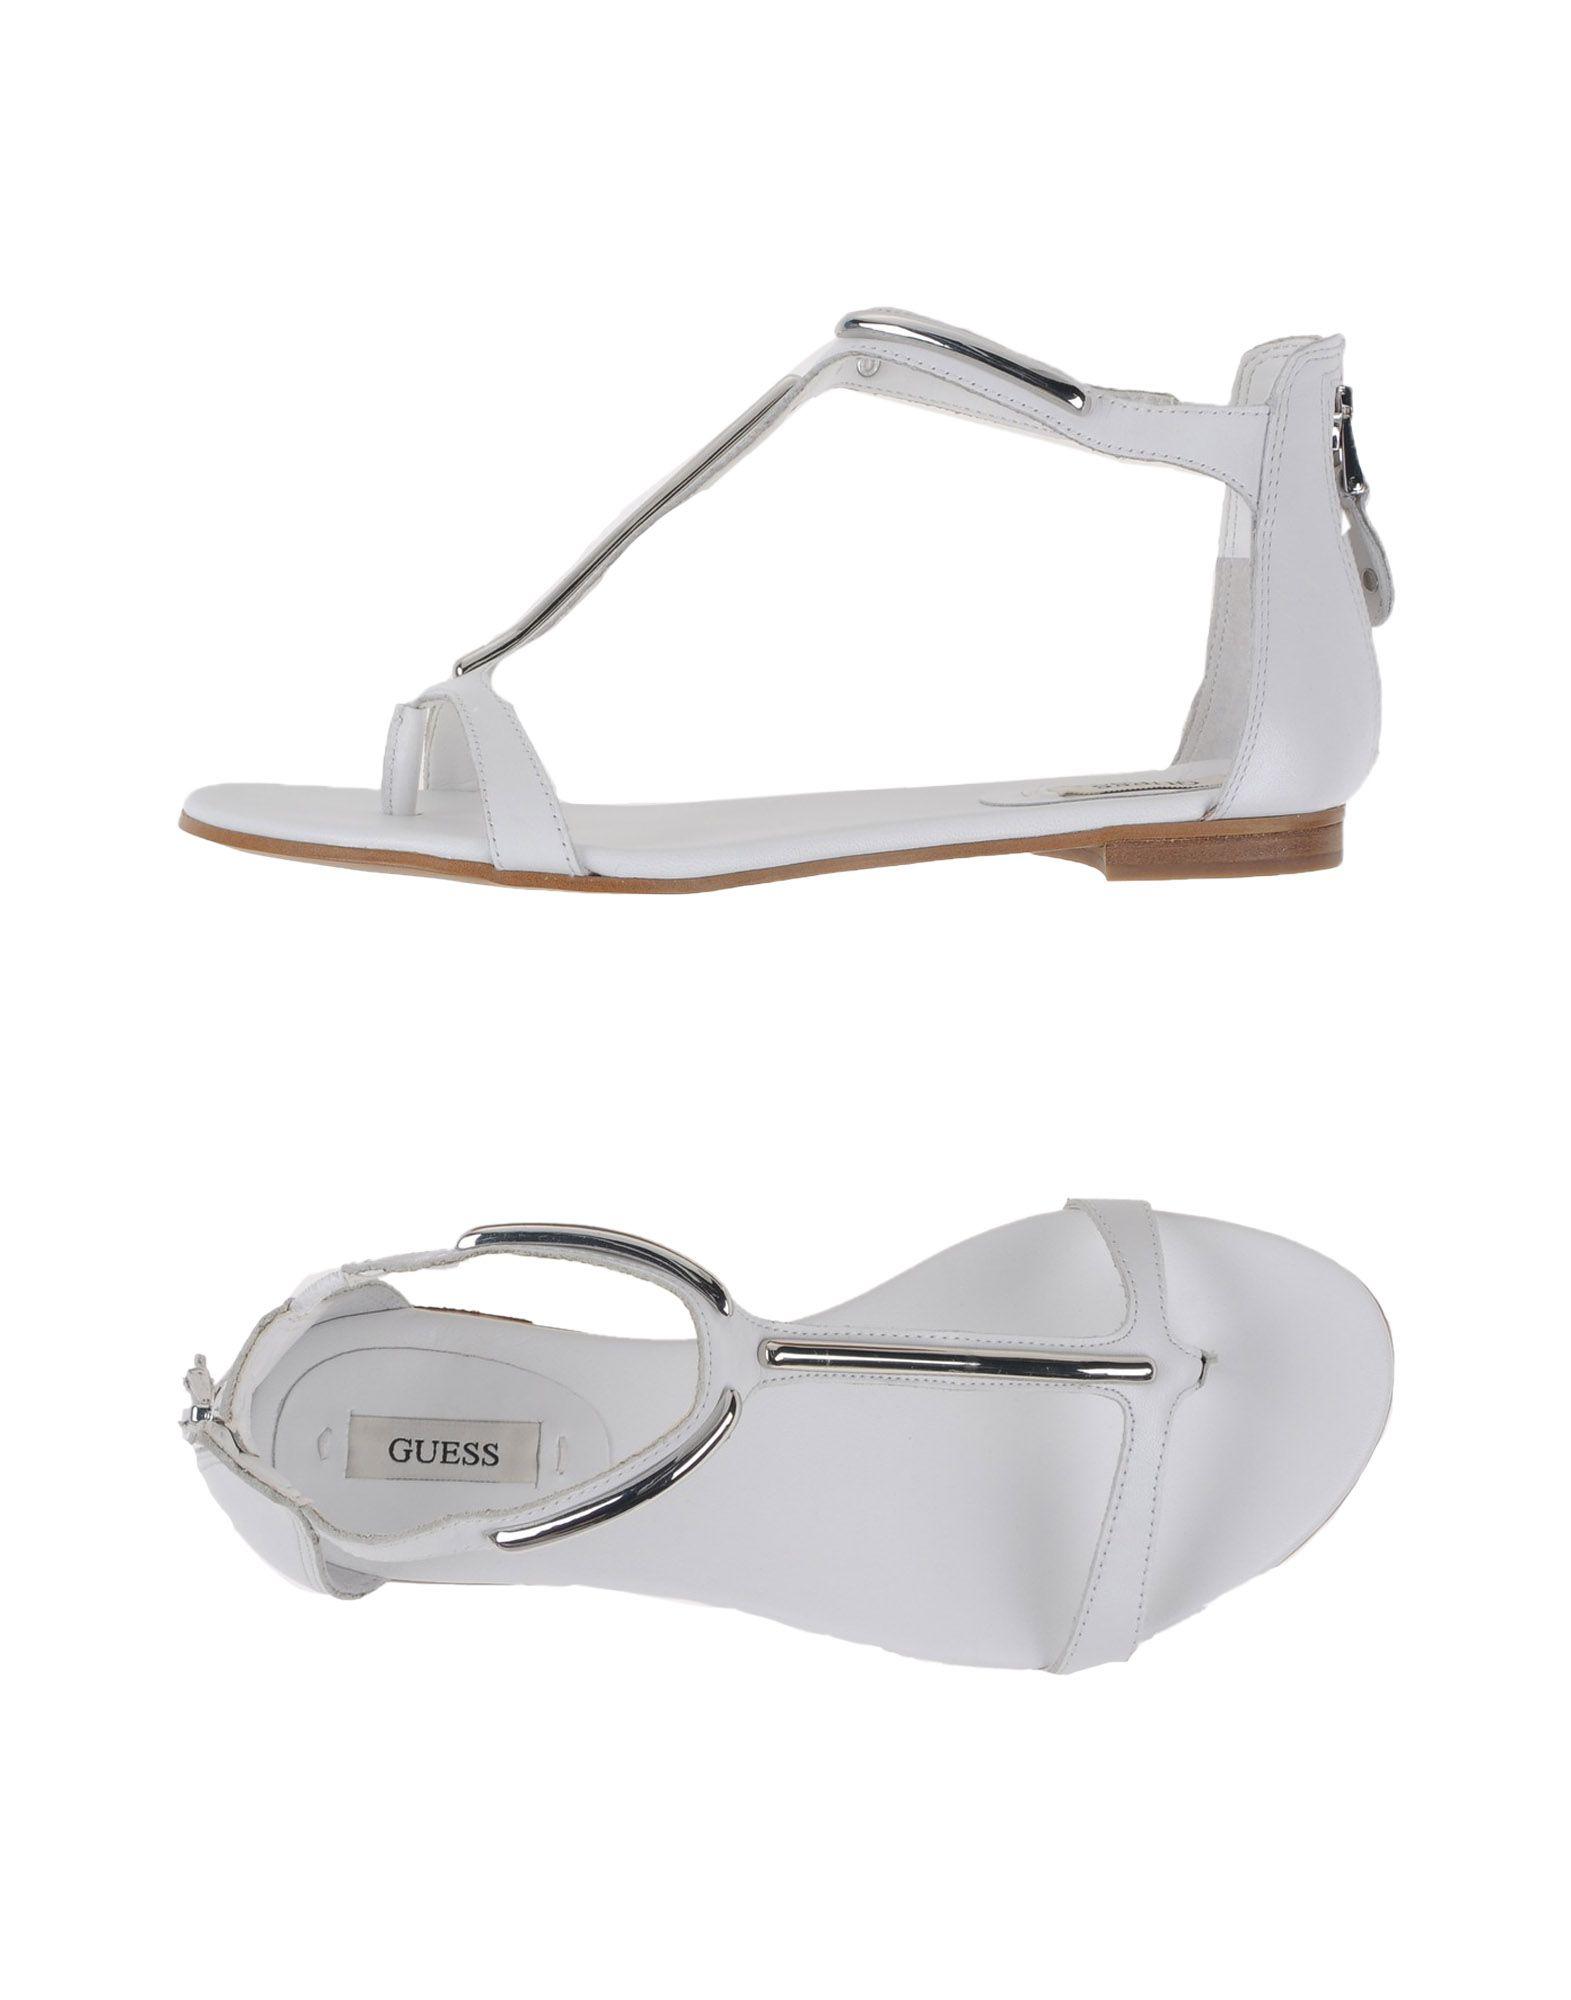 Cheap Guess Flat Shoes